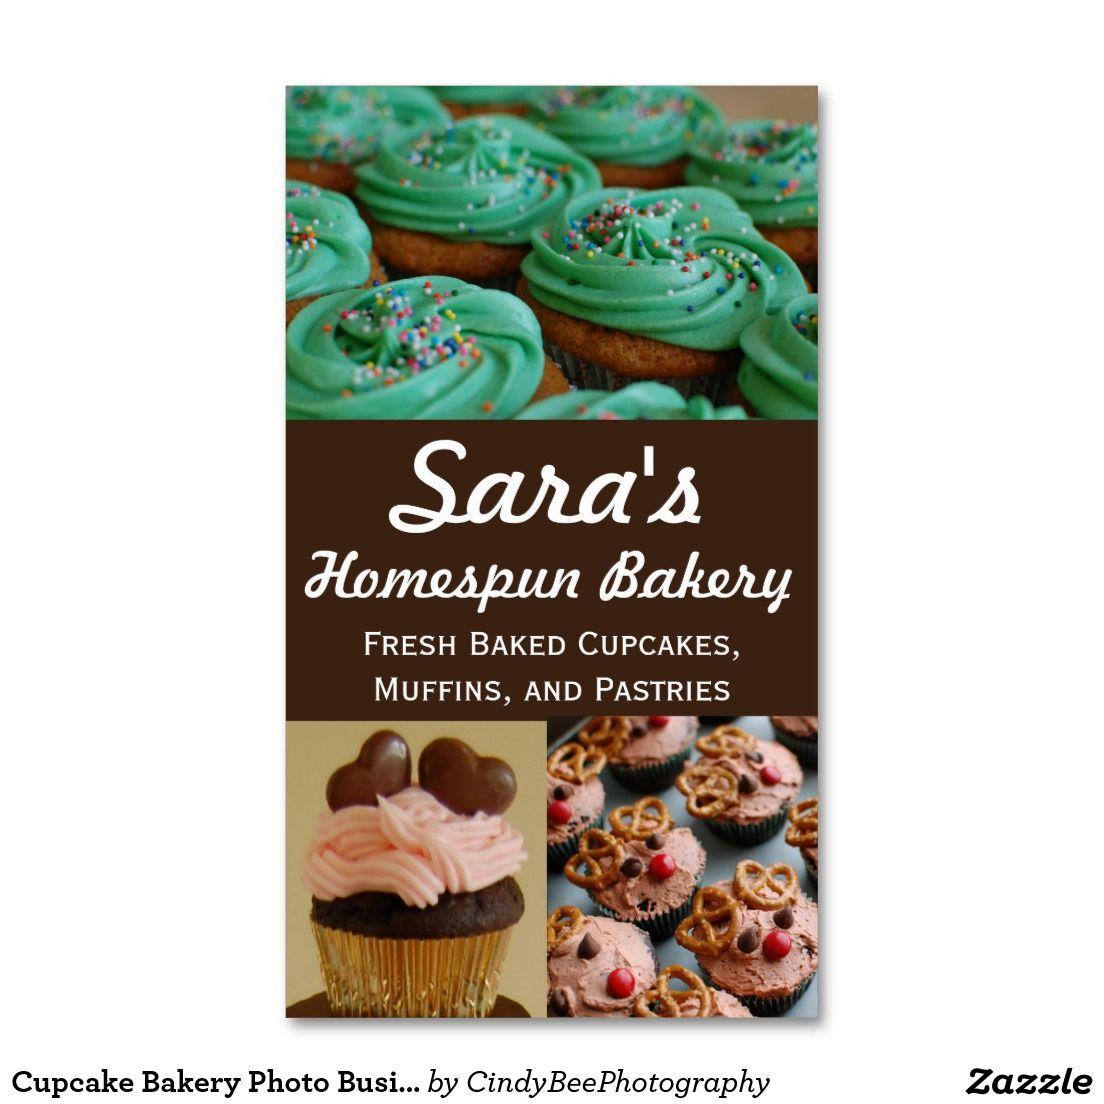 Cupcake Bakery Photo Business Cards | Cupcake bakery, Business cards ...